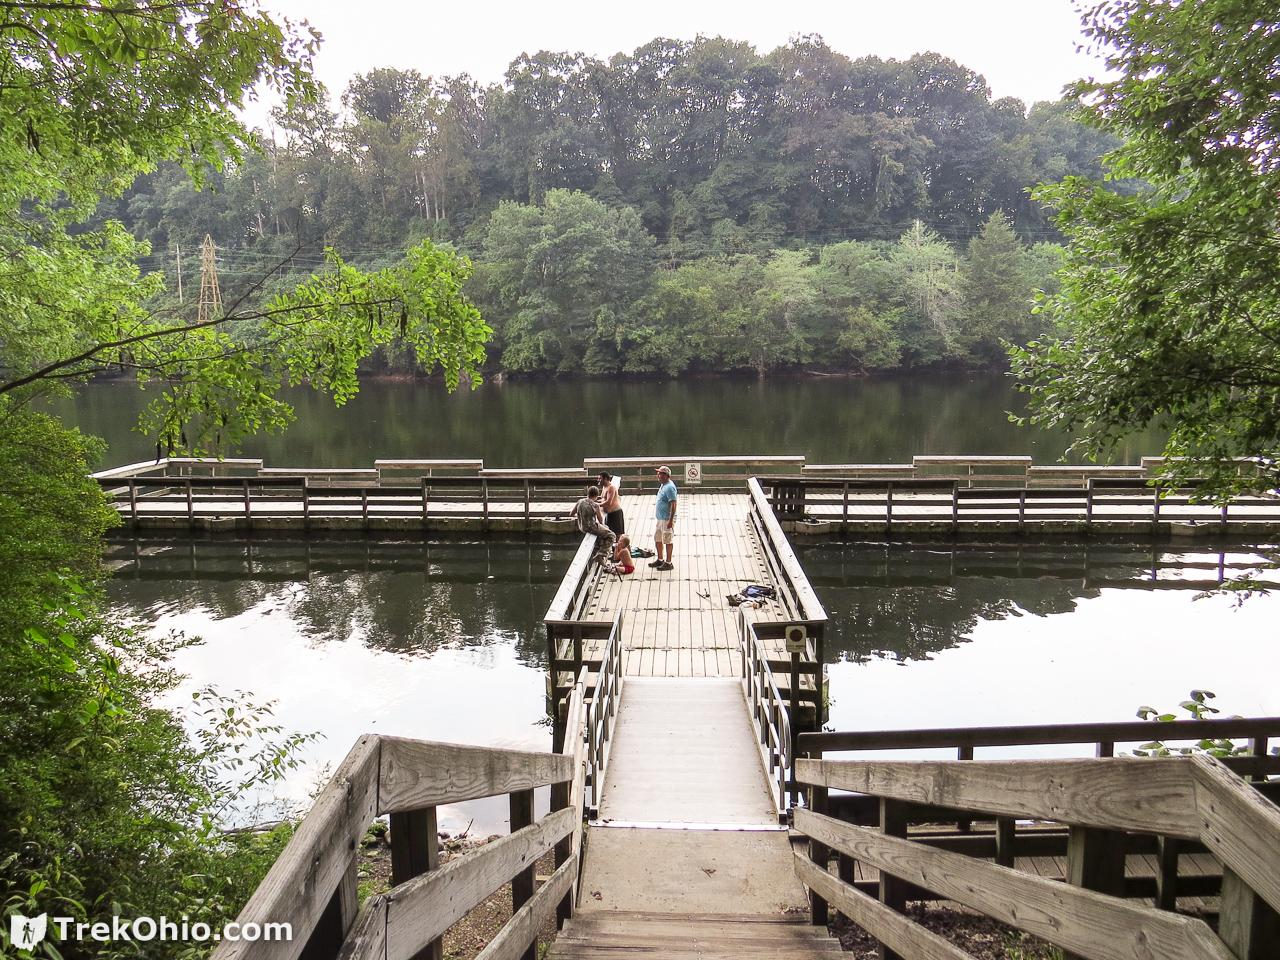 Gorge metro park trekohio for Fishing docks near me